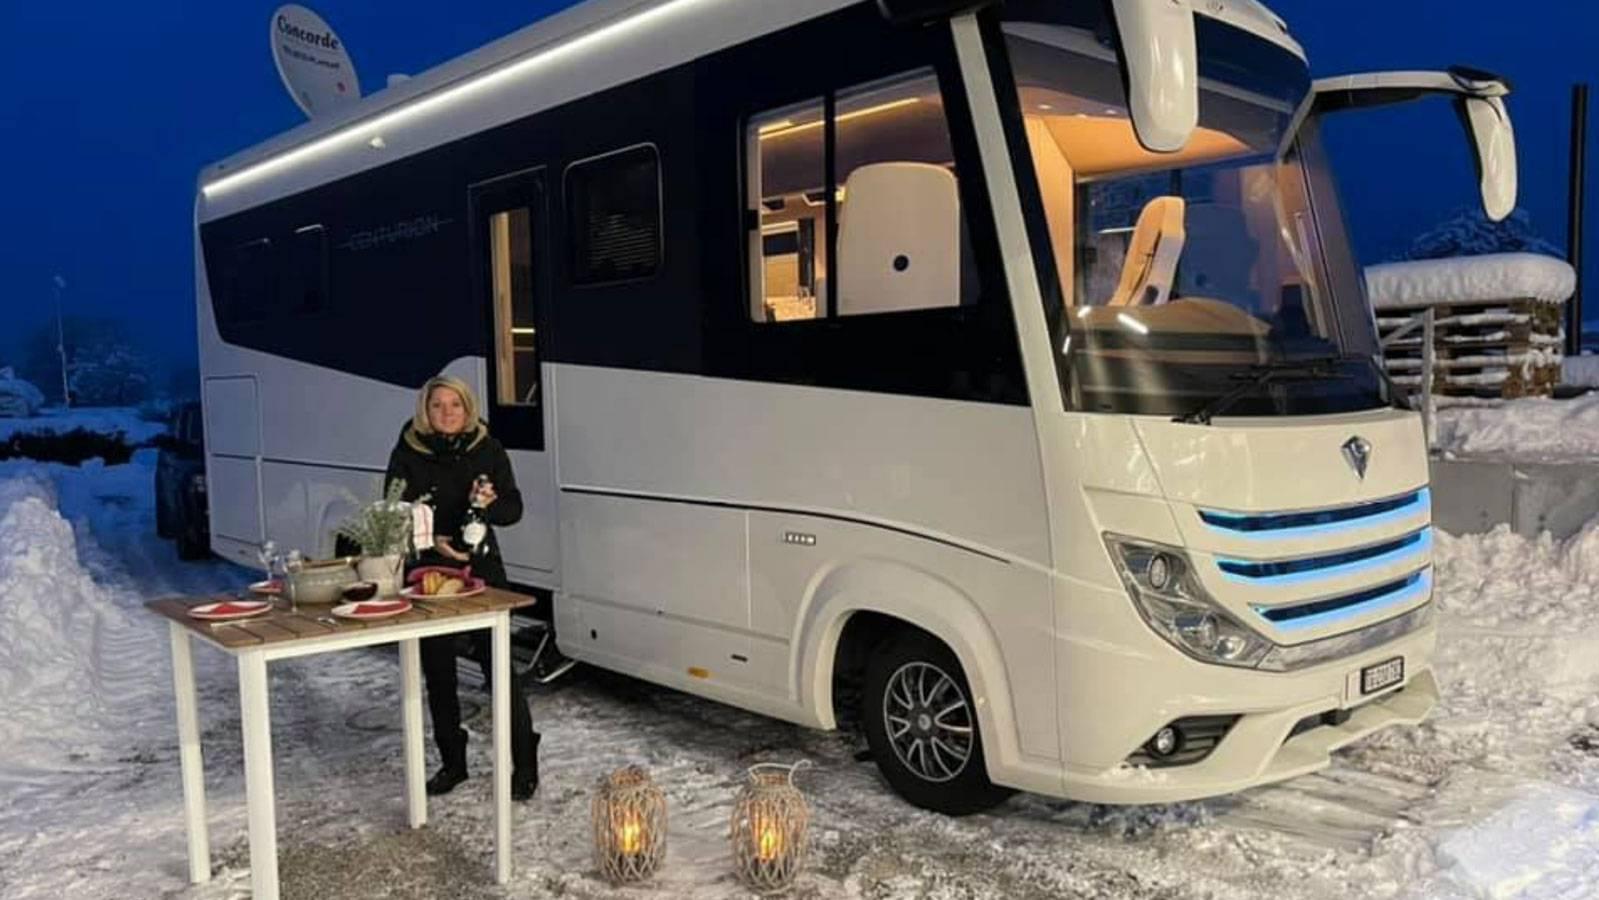 Wohnmobil_Dinner_egnach